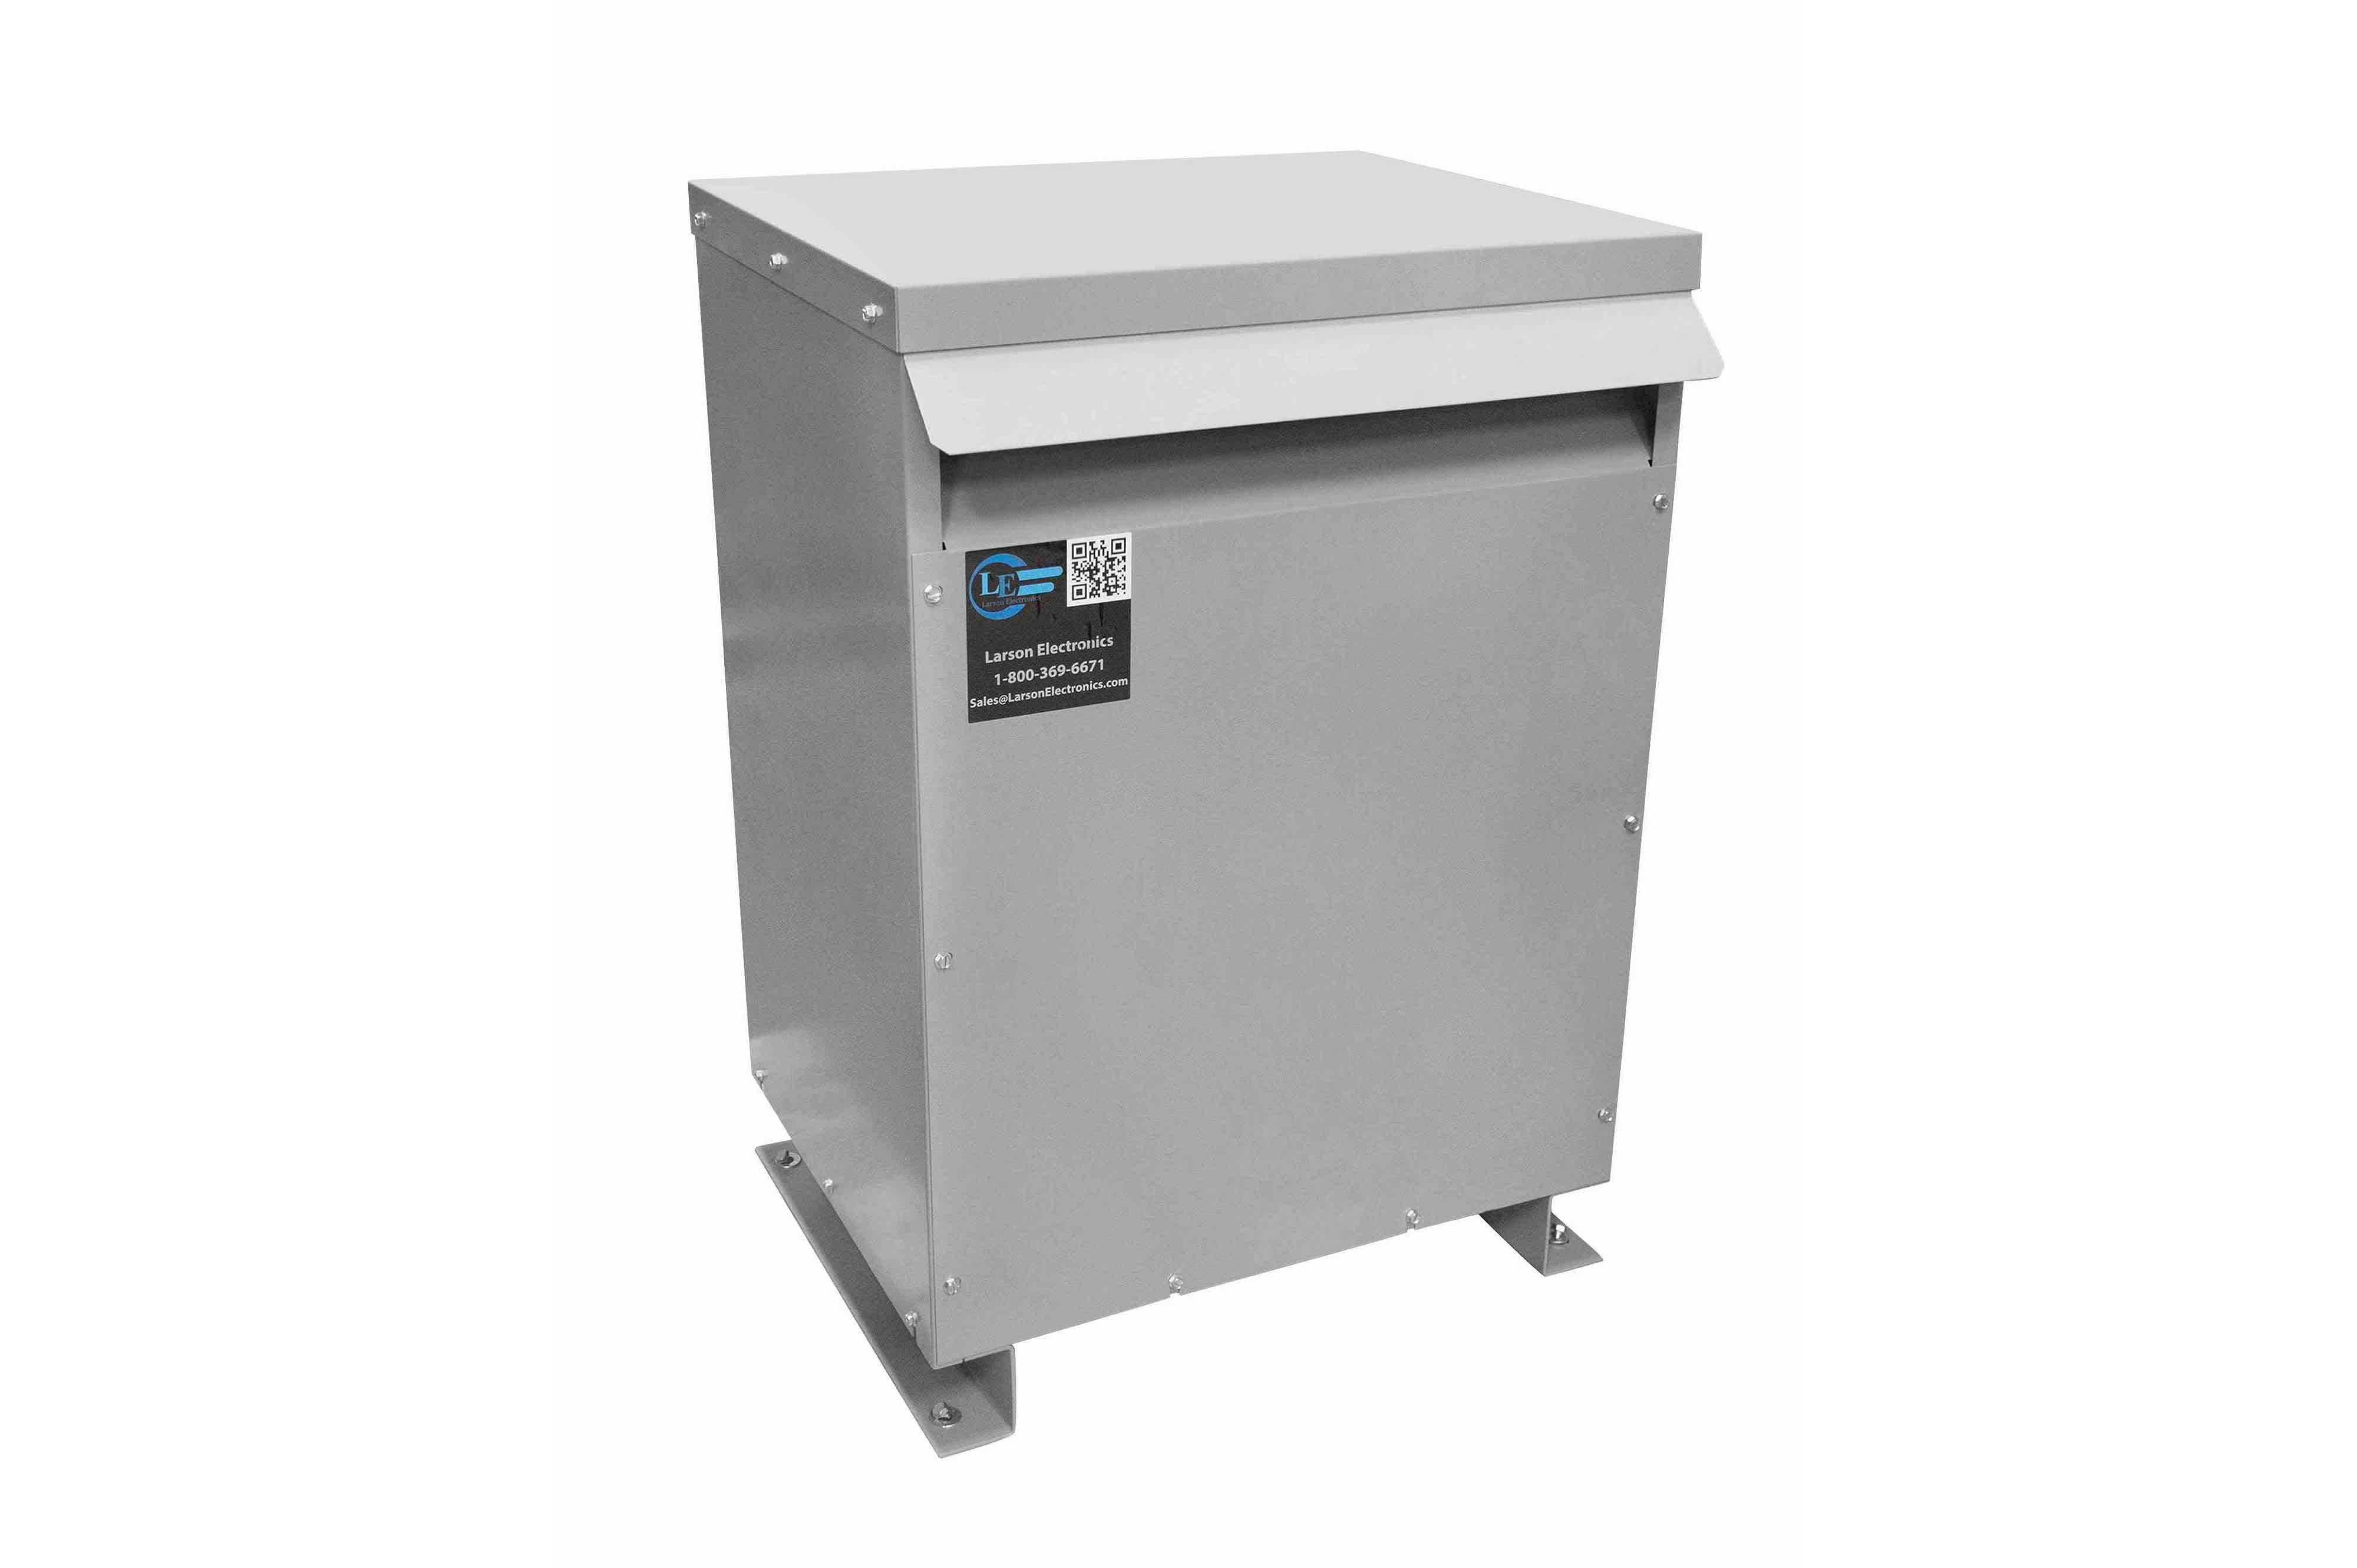 700 kVA 3PH Isolation Transformer, 460V Wye Primary, 600Y/347 Wye-N Secondary, N3R, Ventilated, 60 Hz